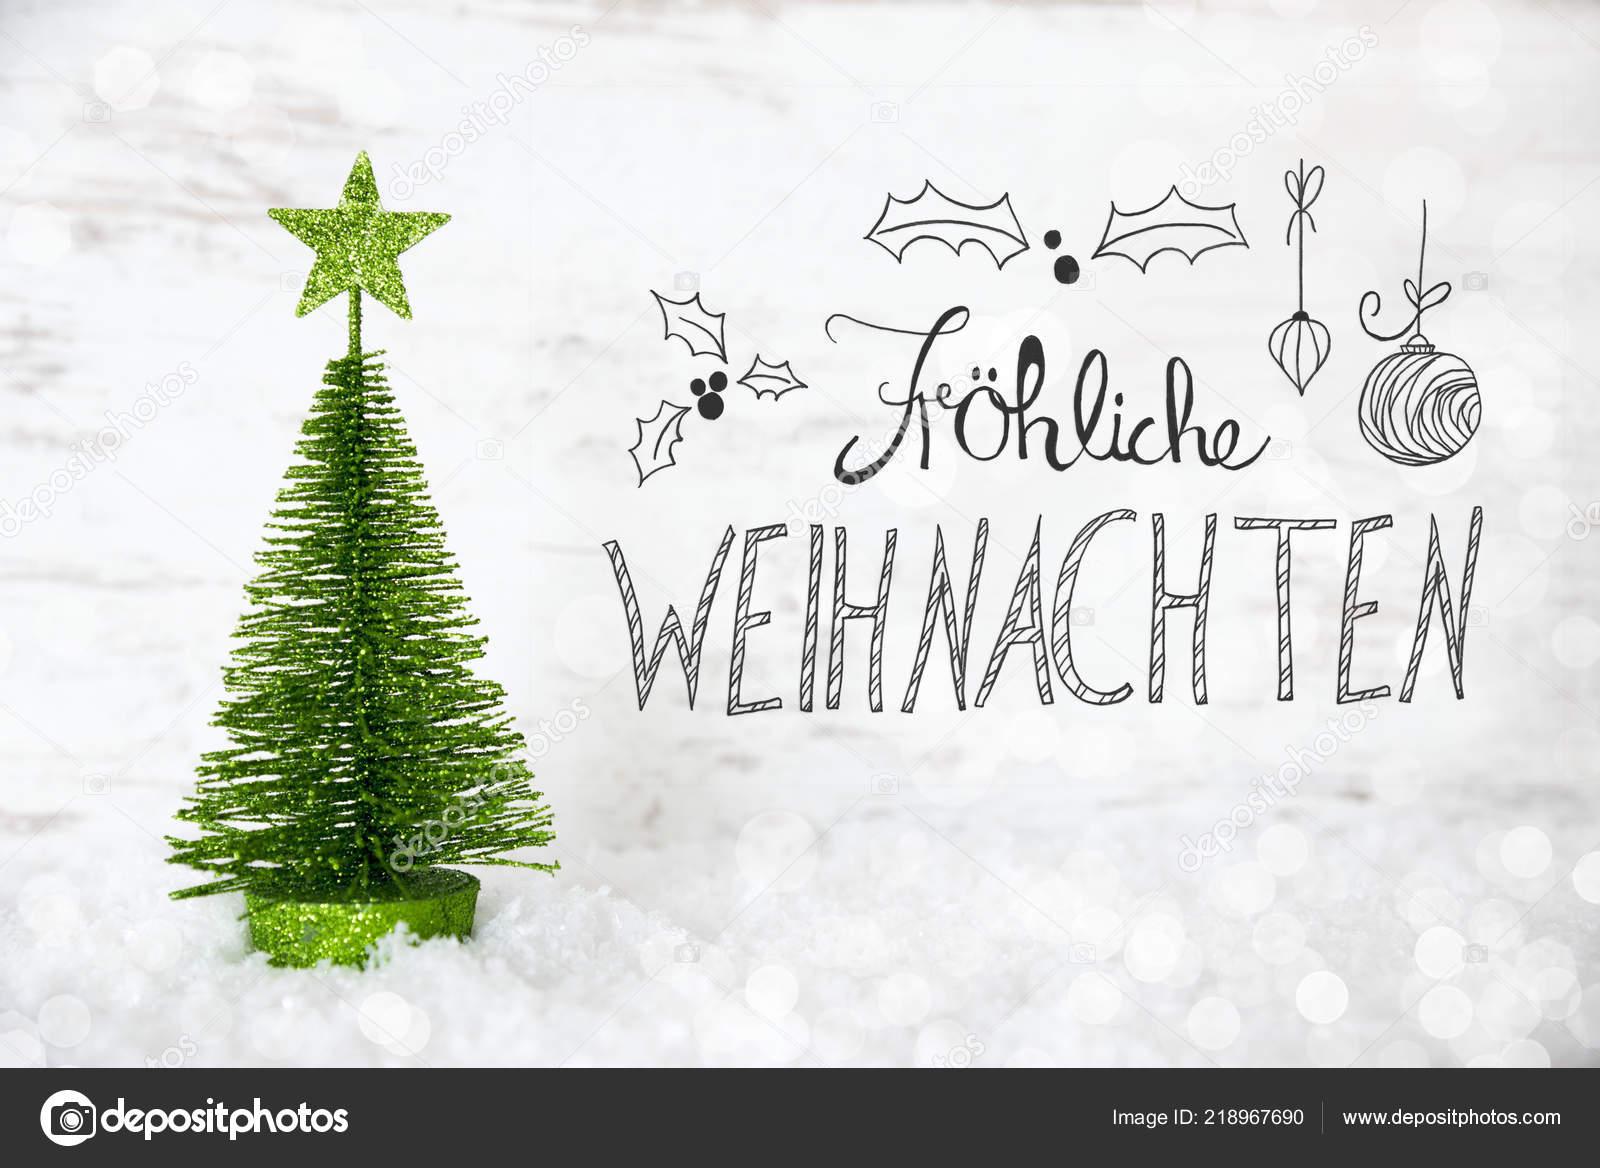 Green Tree, Snow, Calligraphy Froheliche Weihnachten Means Merry ...